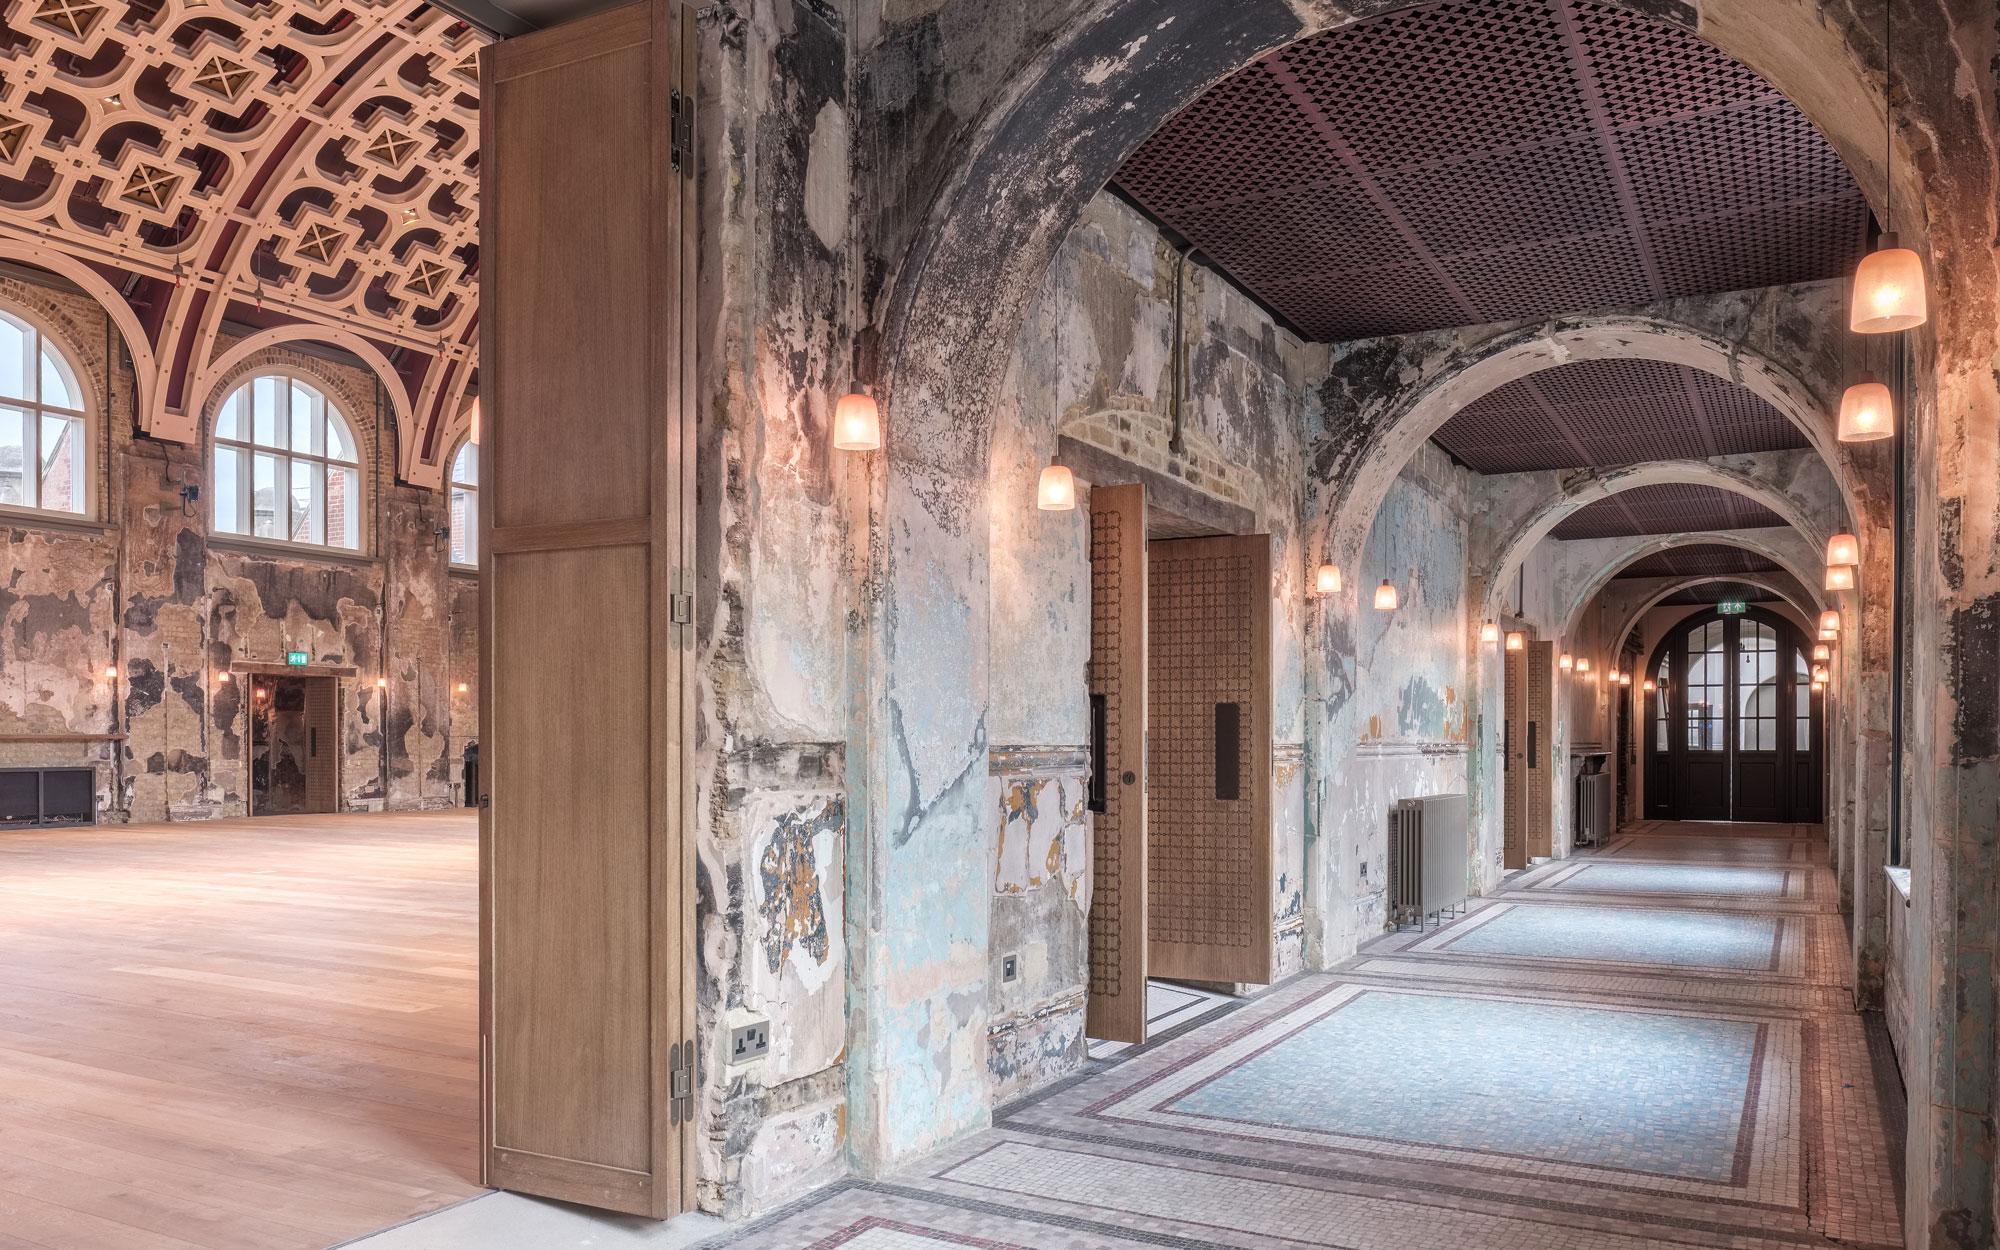 Battersea Arts Centre refurbished